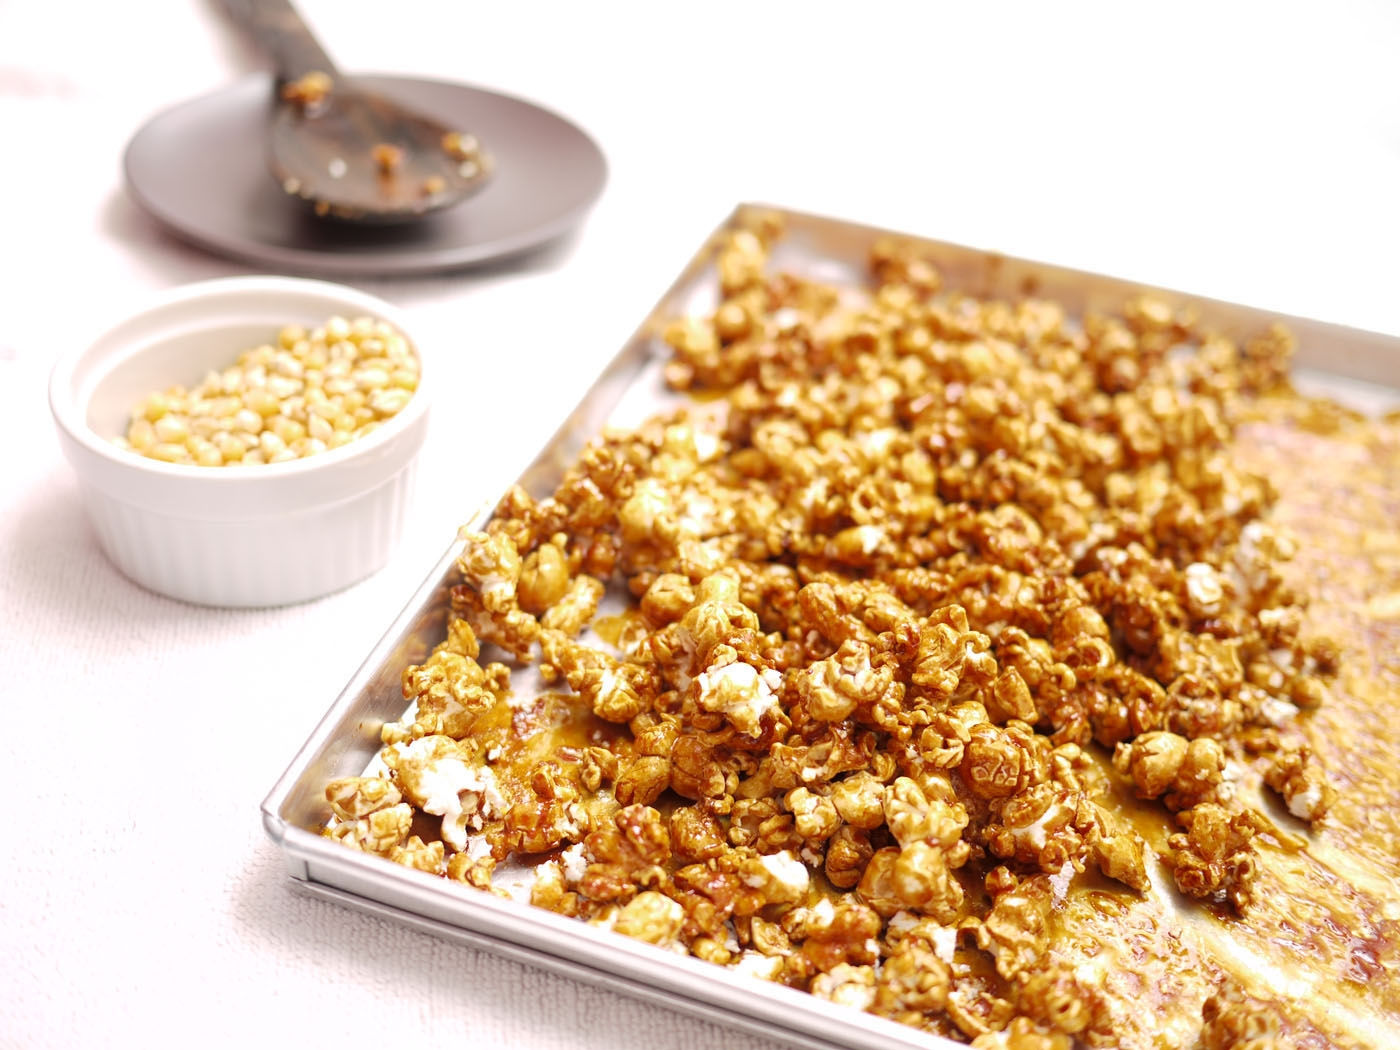 Popcorn clipart caramel popcorn Clipart Caramel Cliparts Popcorn Caramel